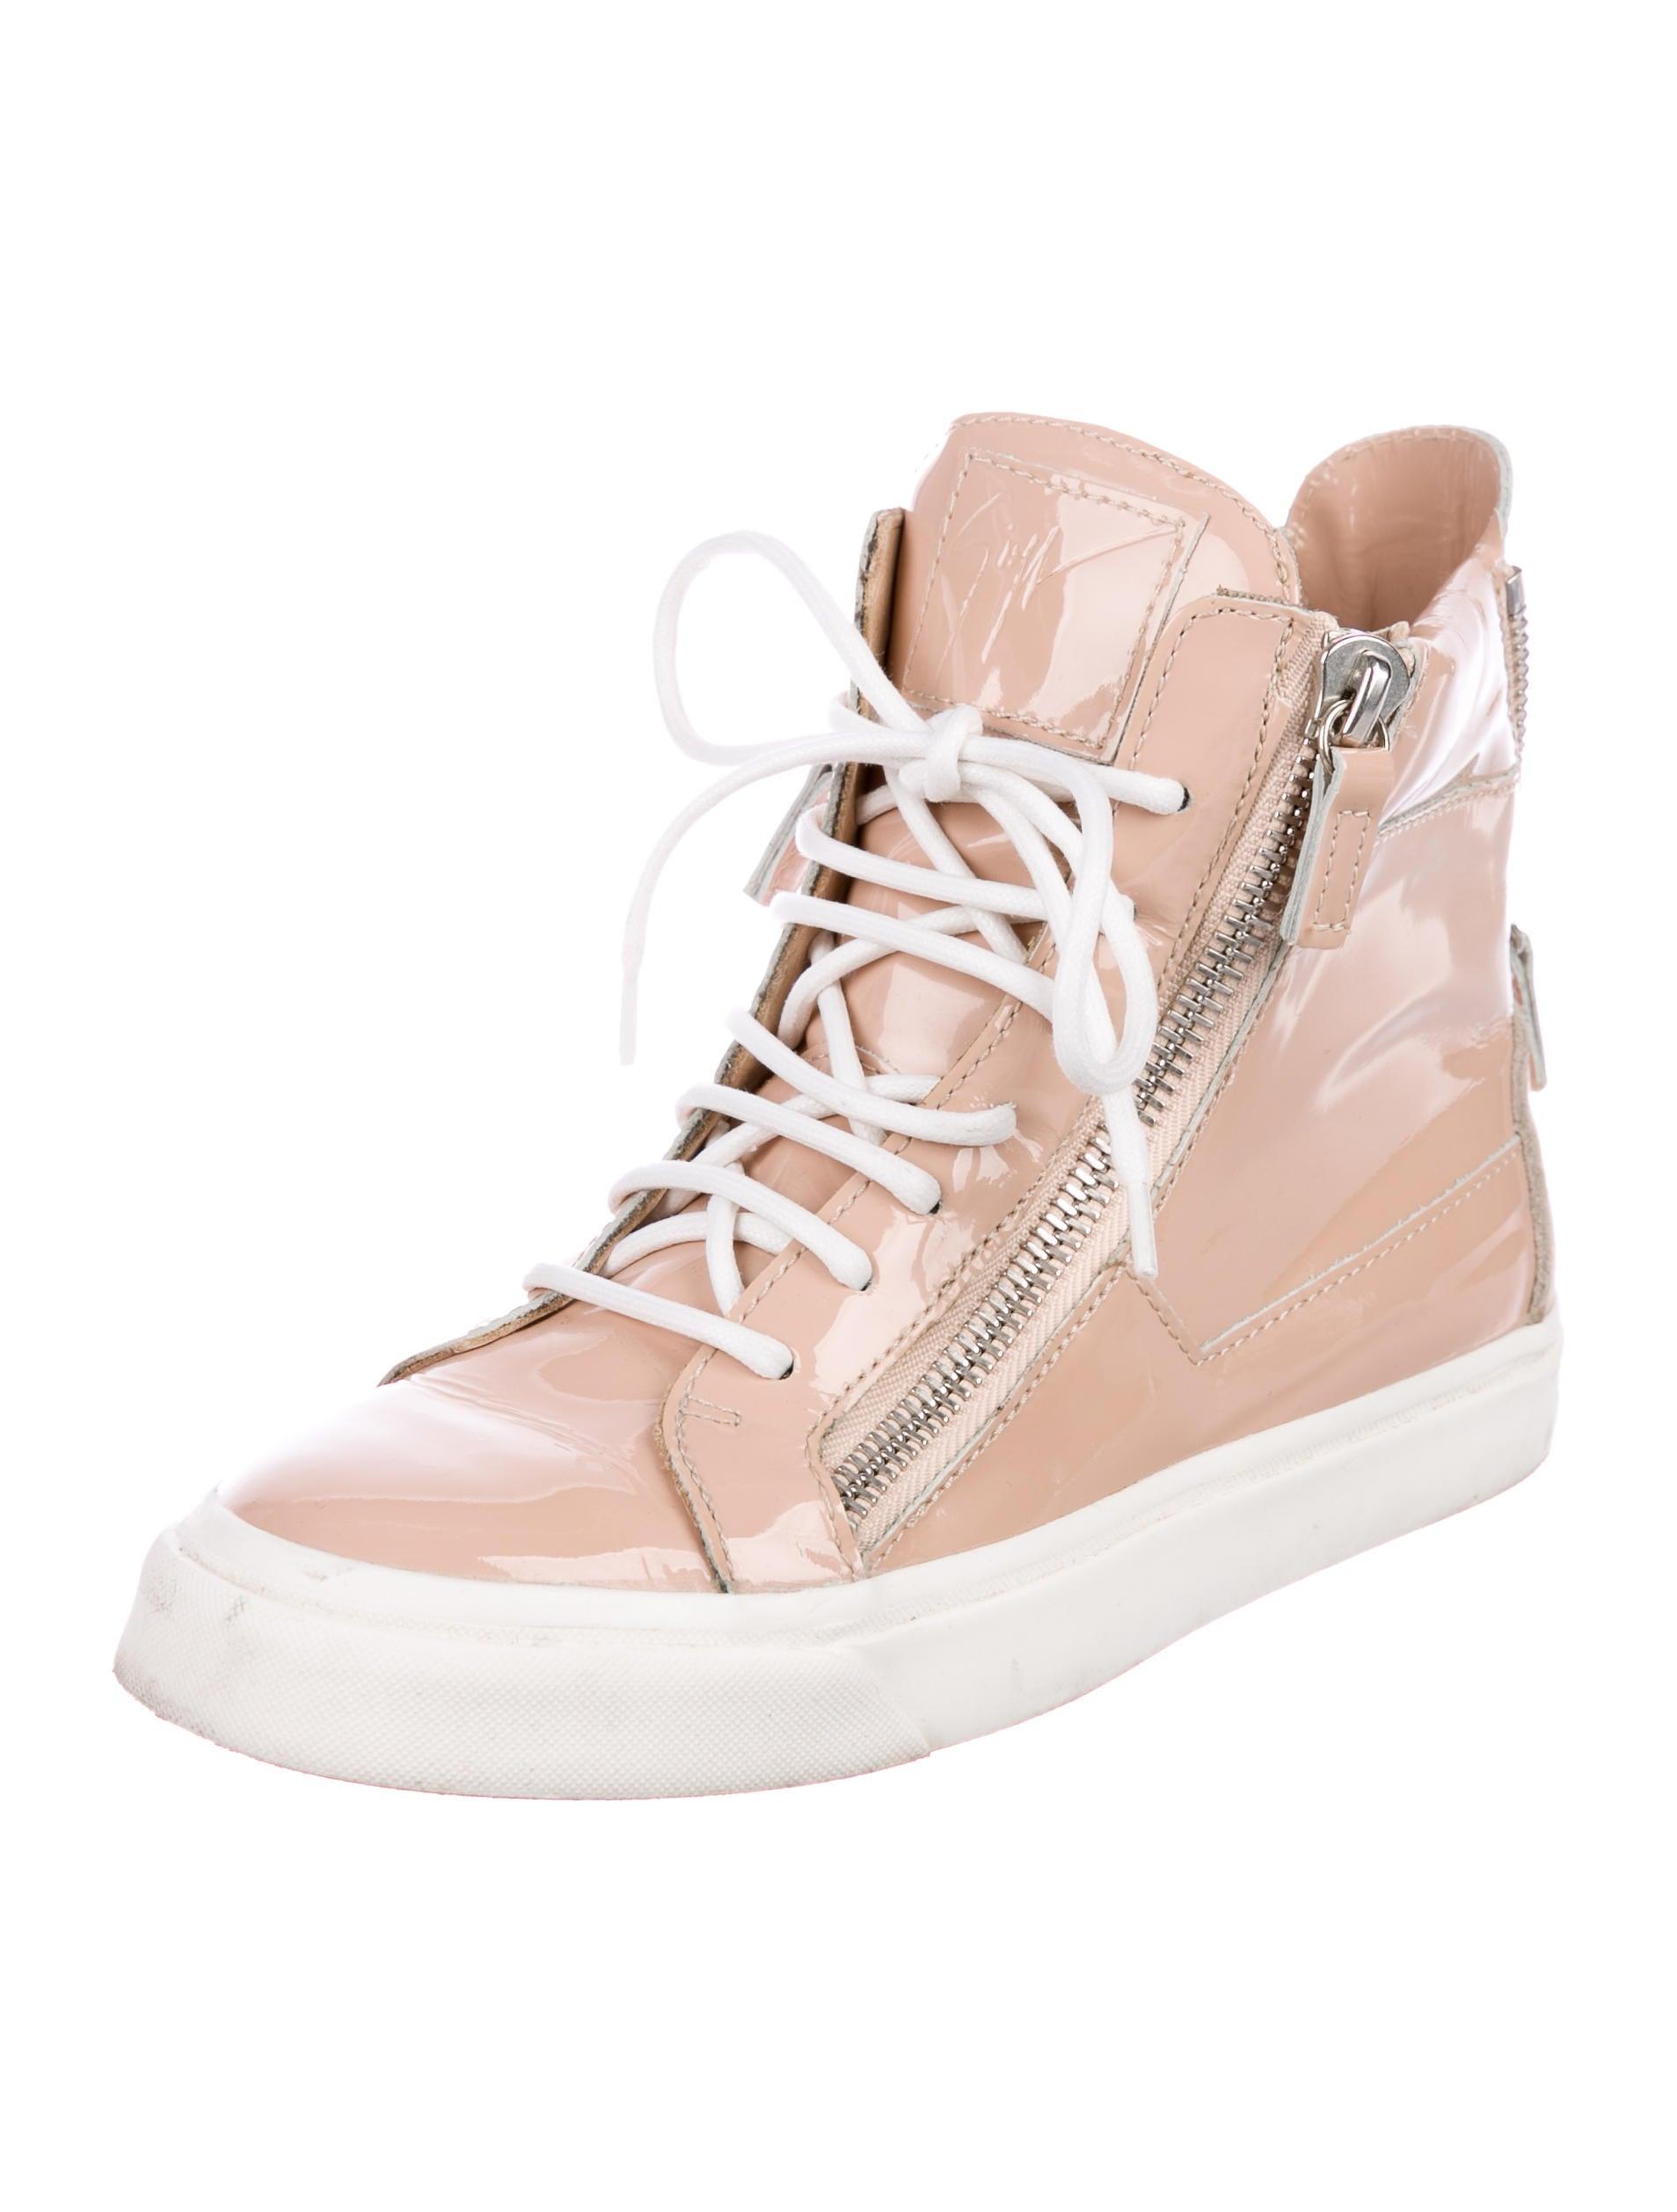 Giuseppe Zanotti August London Patent Sneakers really cheap online cheap visa payment cheap best sale 8BPjpN